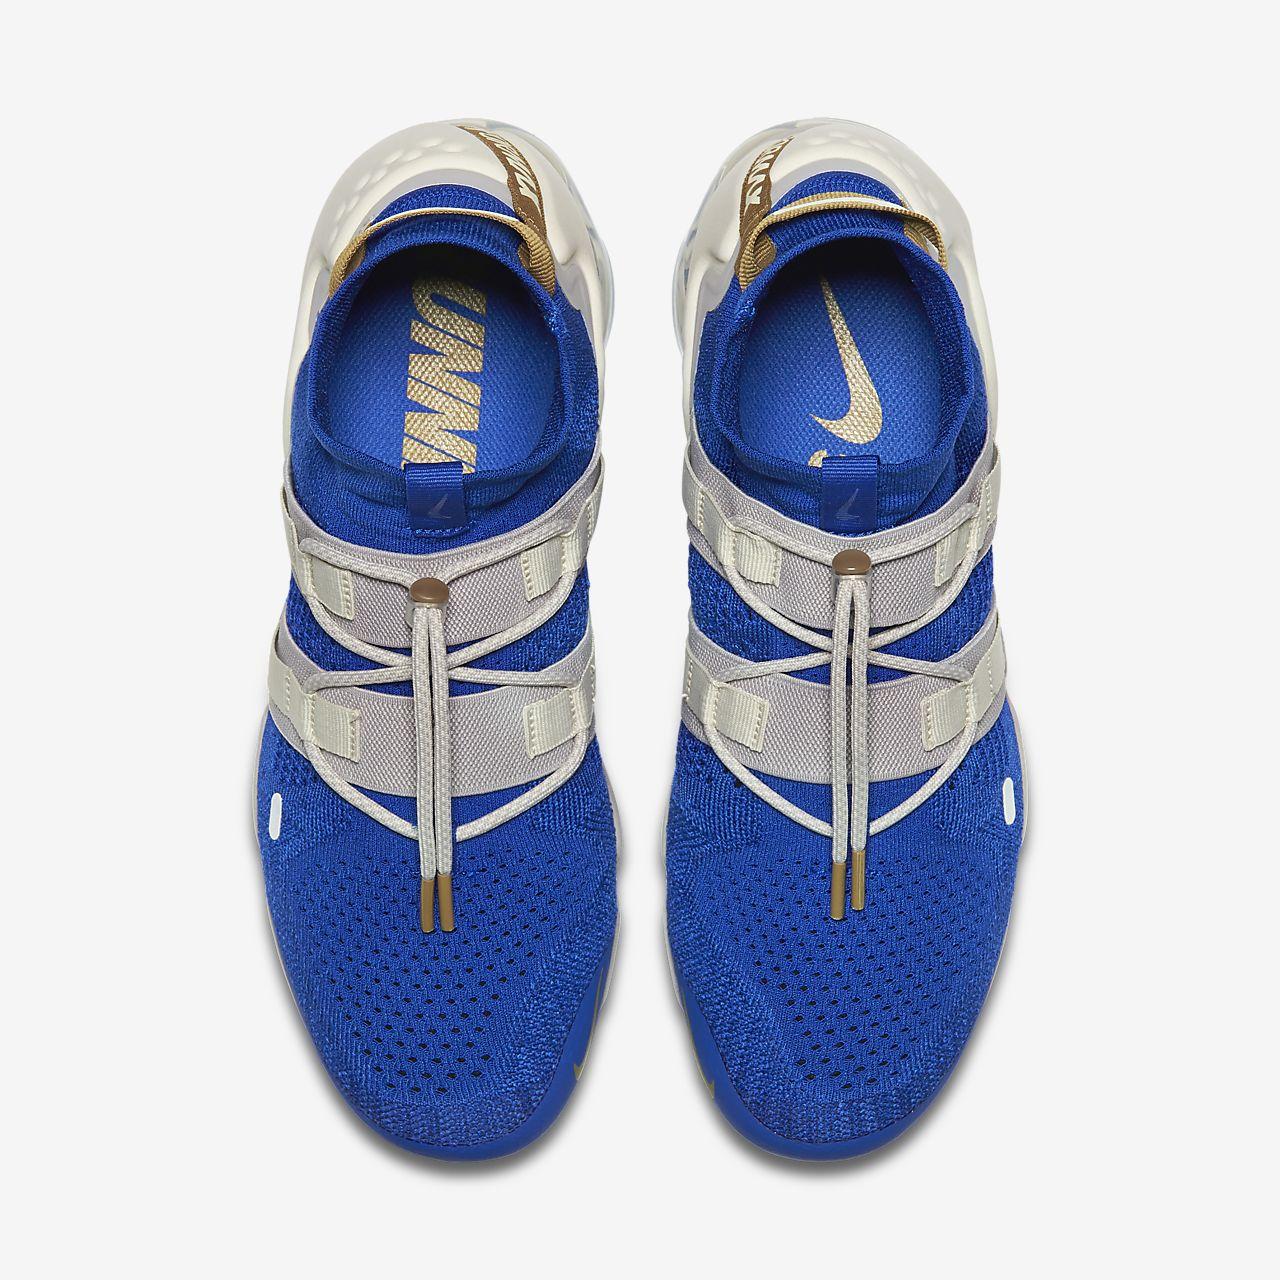 38d4738b1c4a Nike Air VaporMax Flyknit Utility Shoe. Nike.com NL